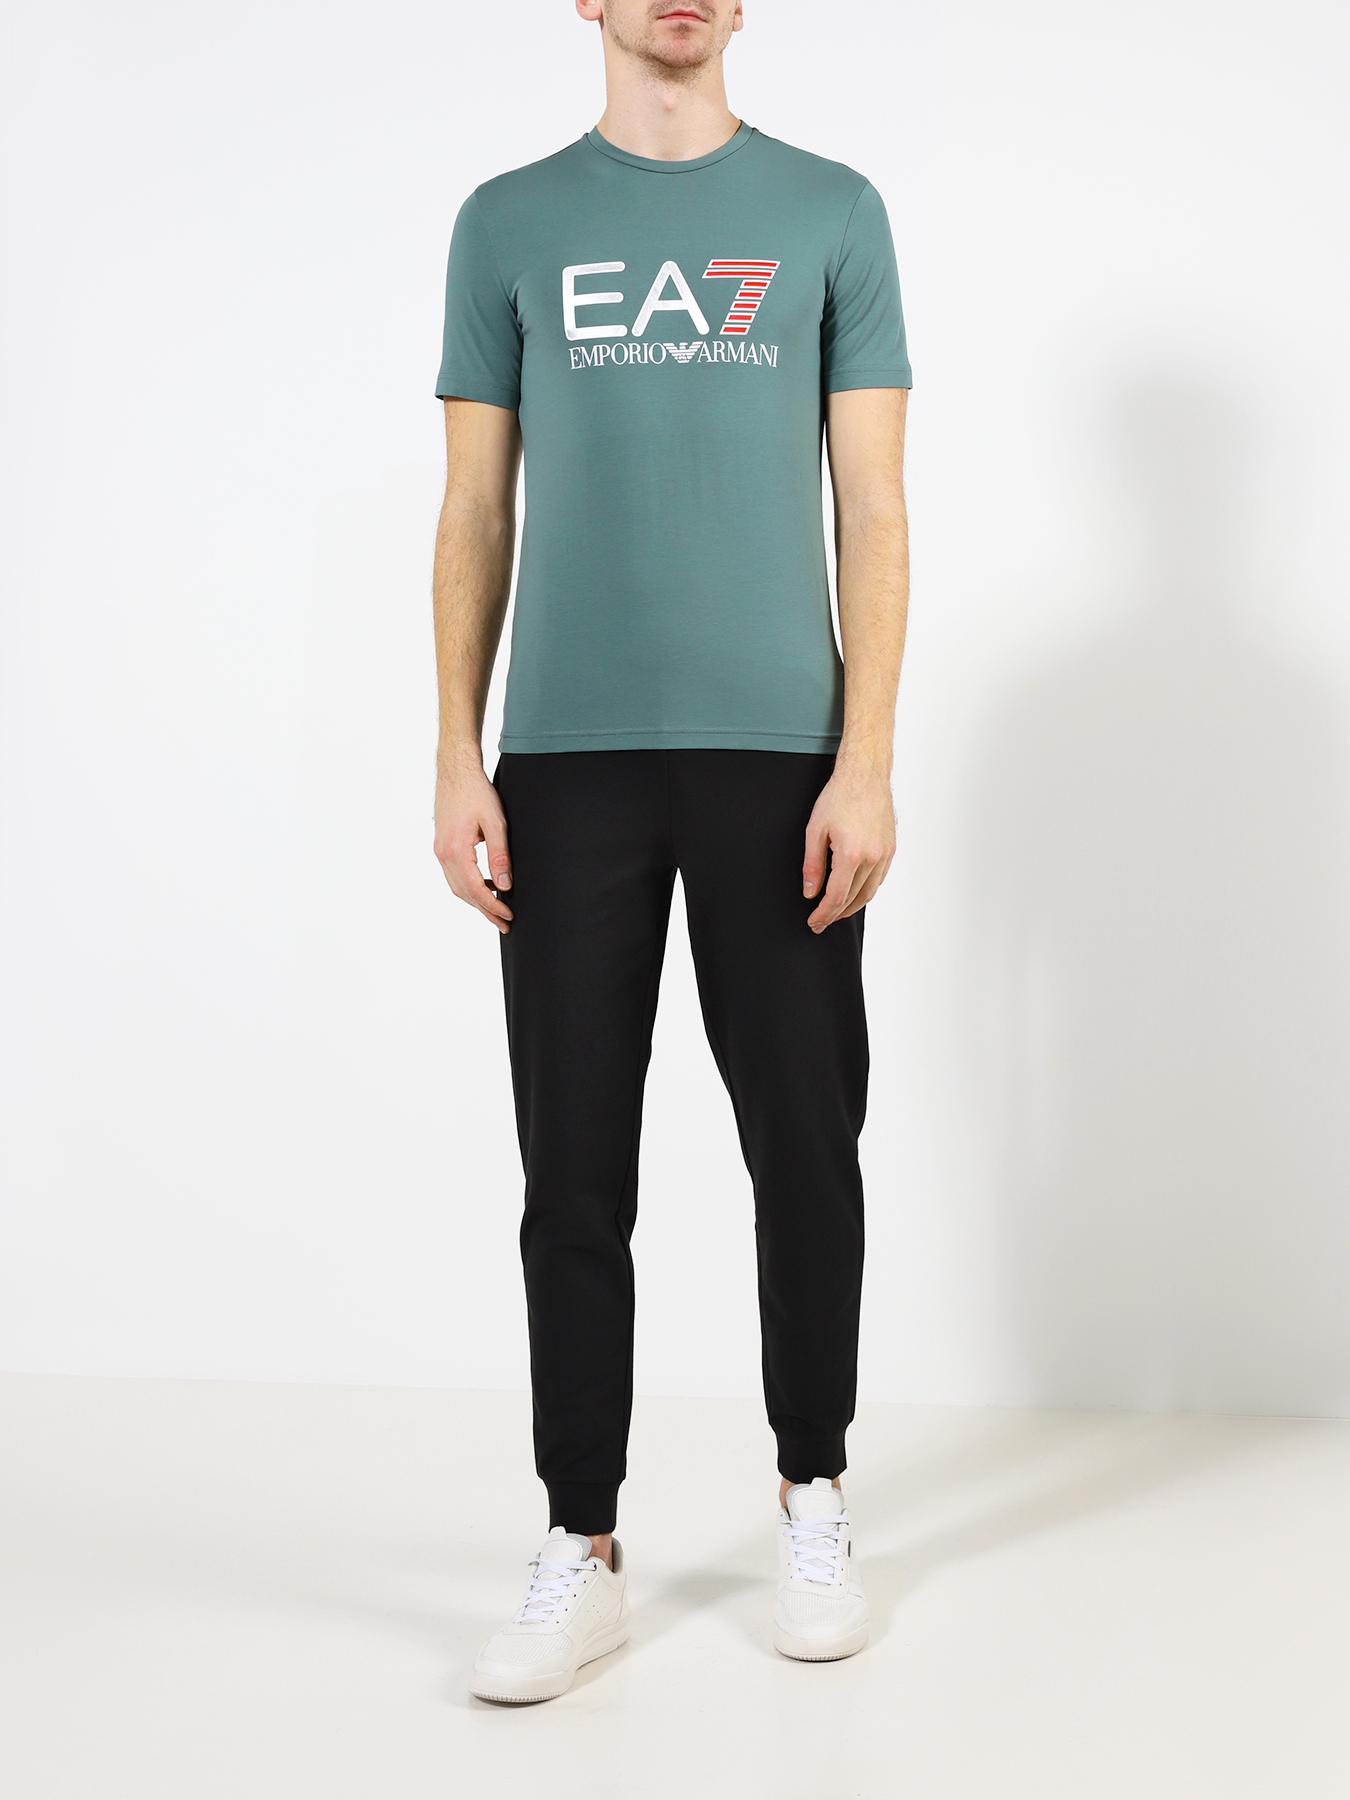 Фото - Фуфайка (футболка) EA7 Emporio Armani Футболка ea7 ea002emuei30